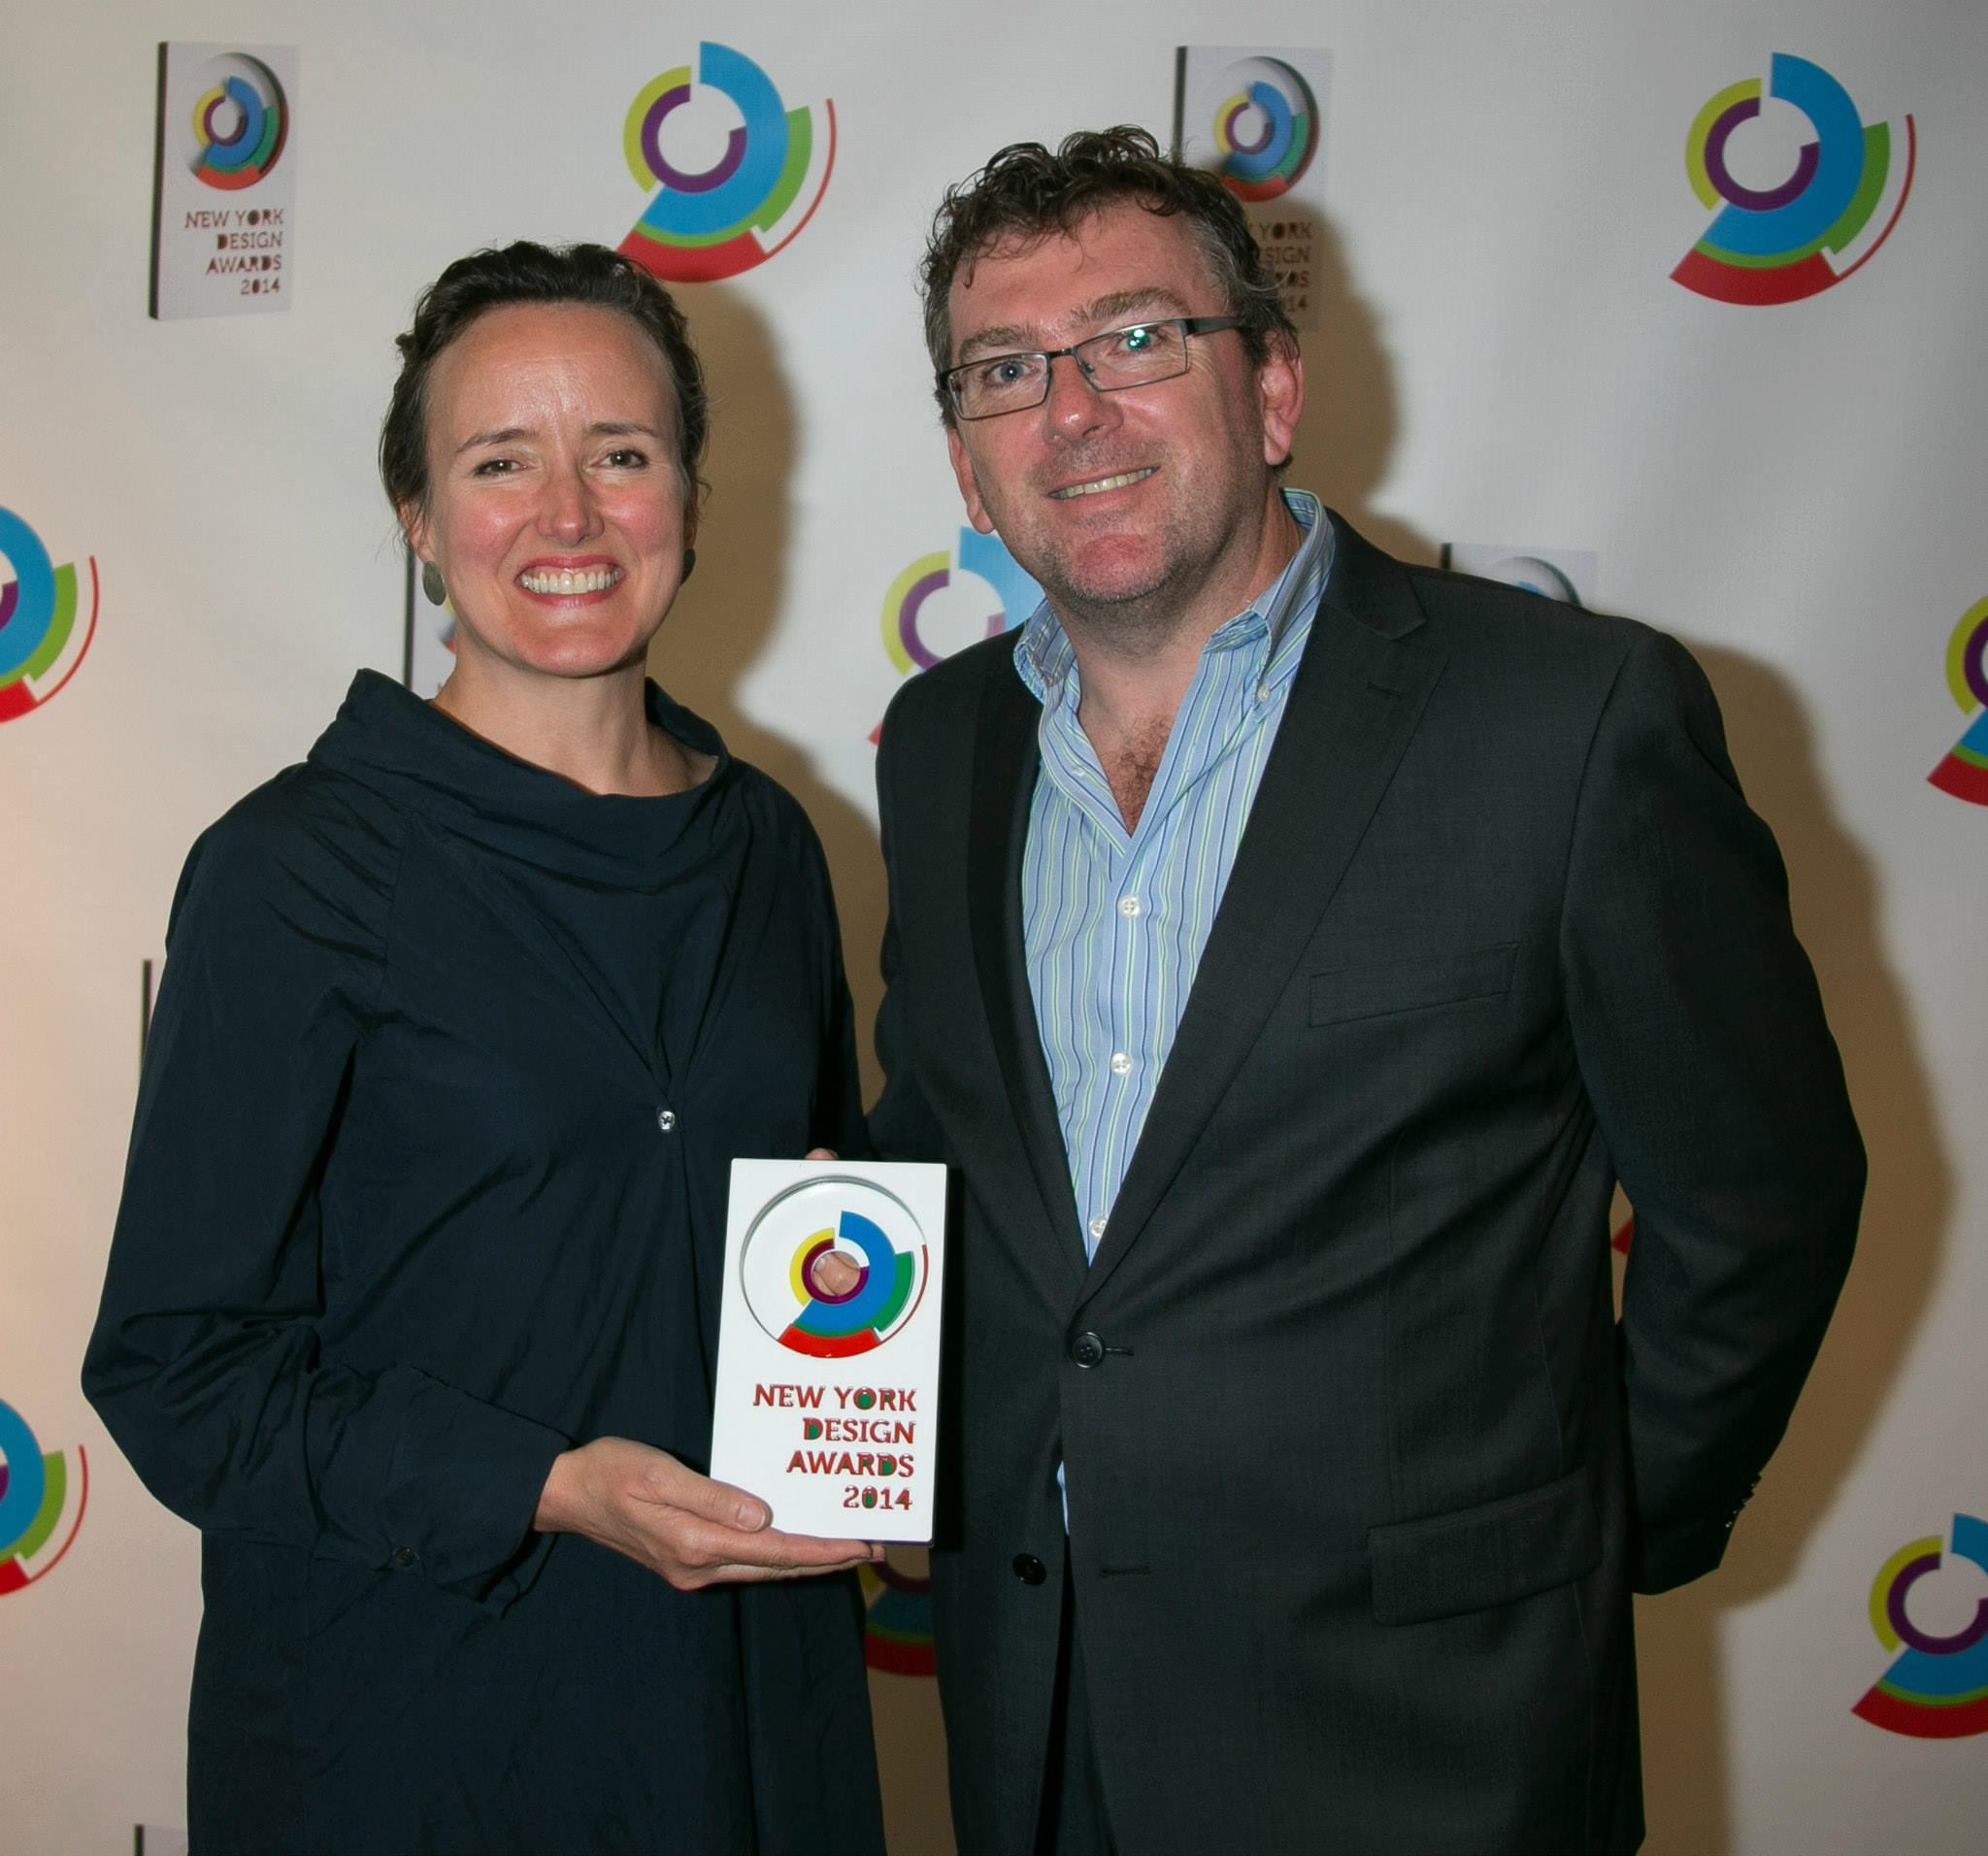 Victoria Milne receives New York Design Award, 2014